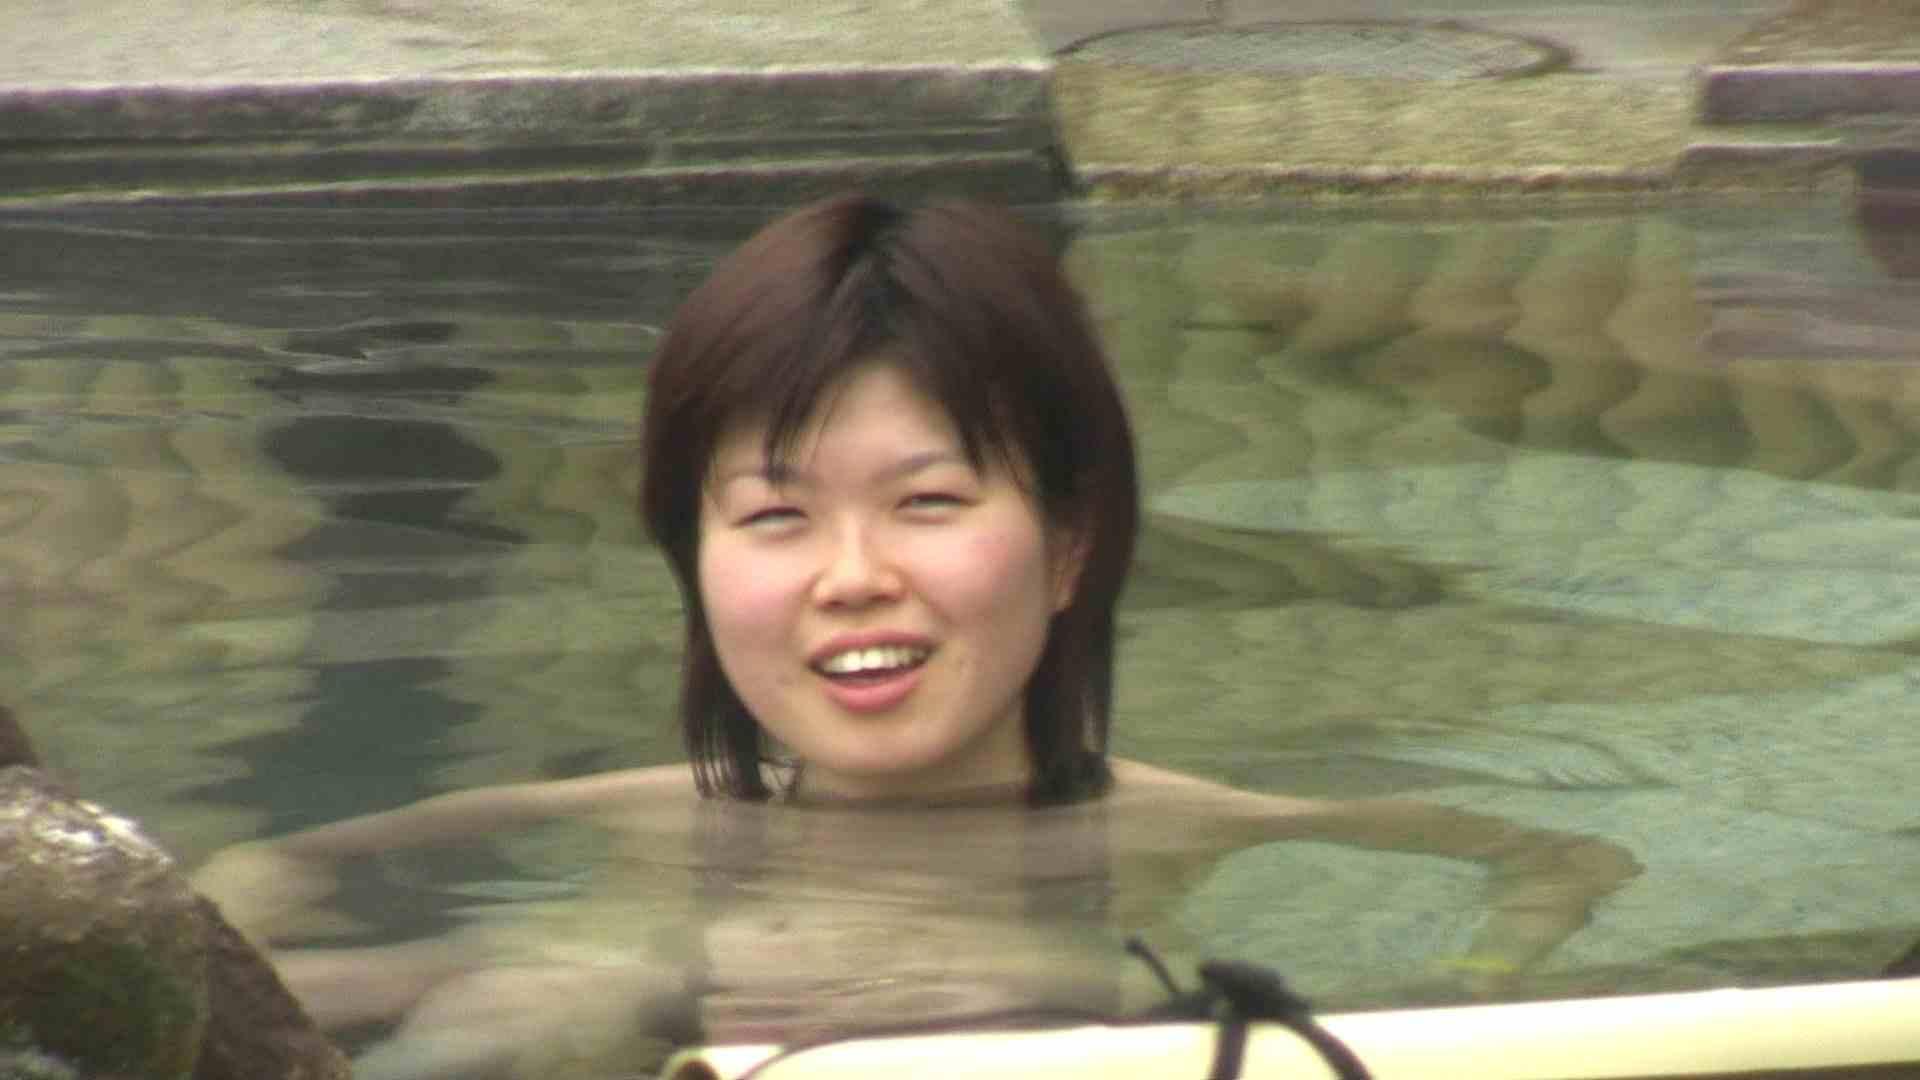 Aquaな露天風呂Vol.675 露天 オマンコ動画キャプチャ 77画像 20